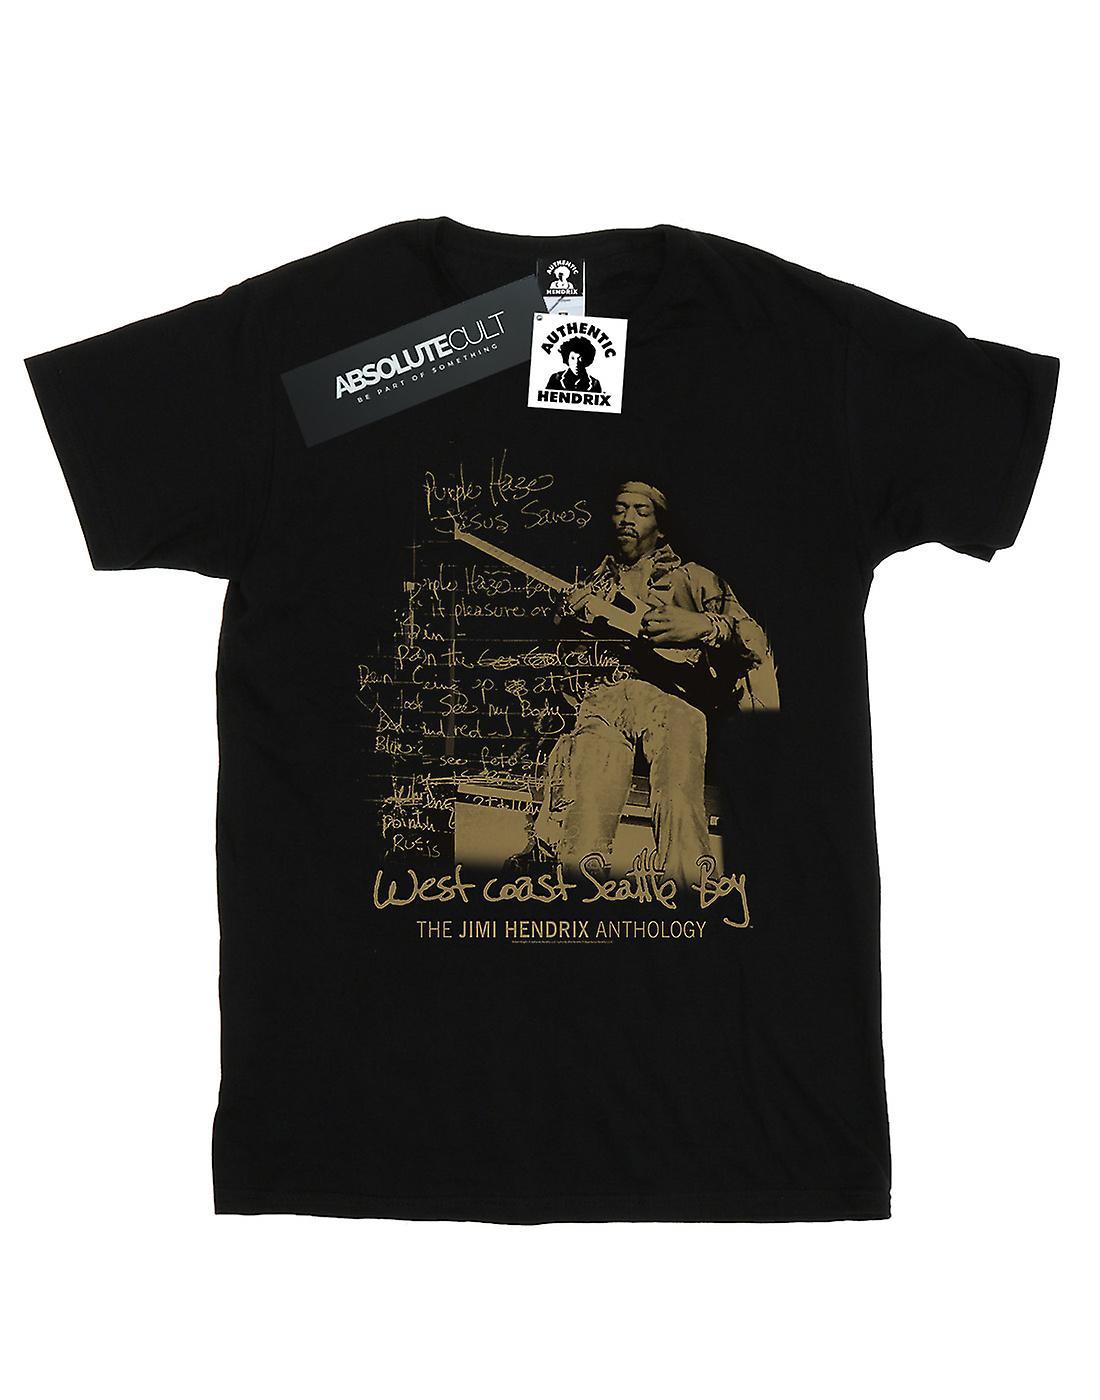 Jimi Hendrix Girls West Coast Seattle Boy T-Shirt